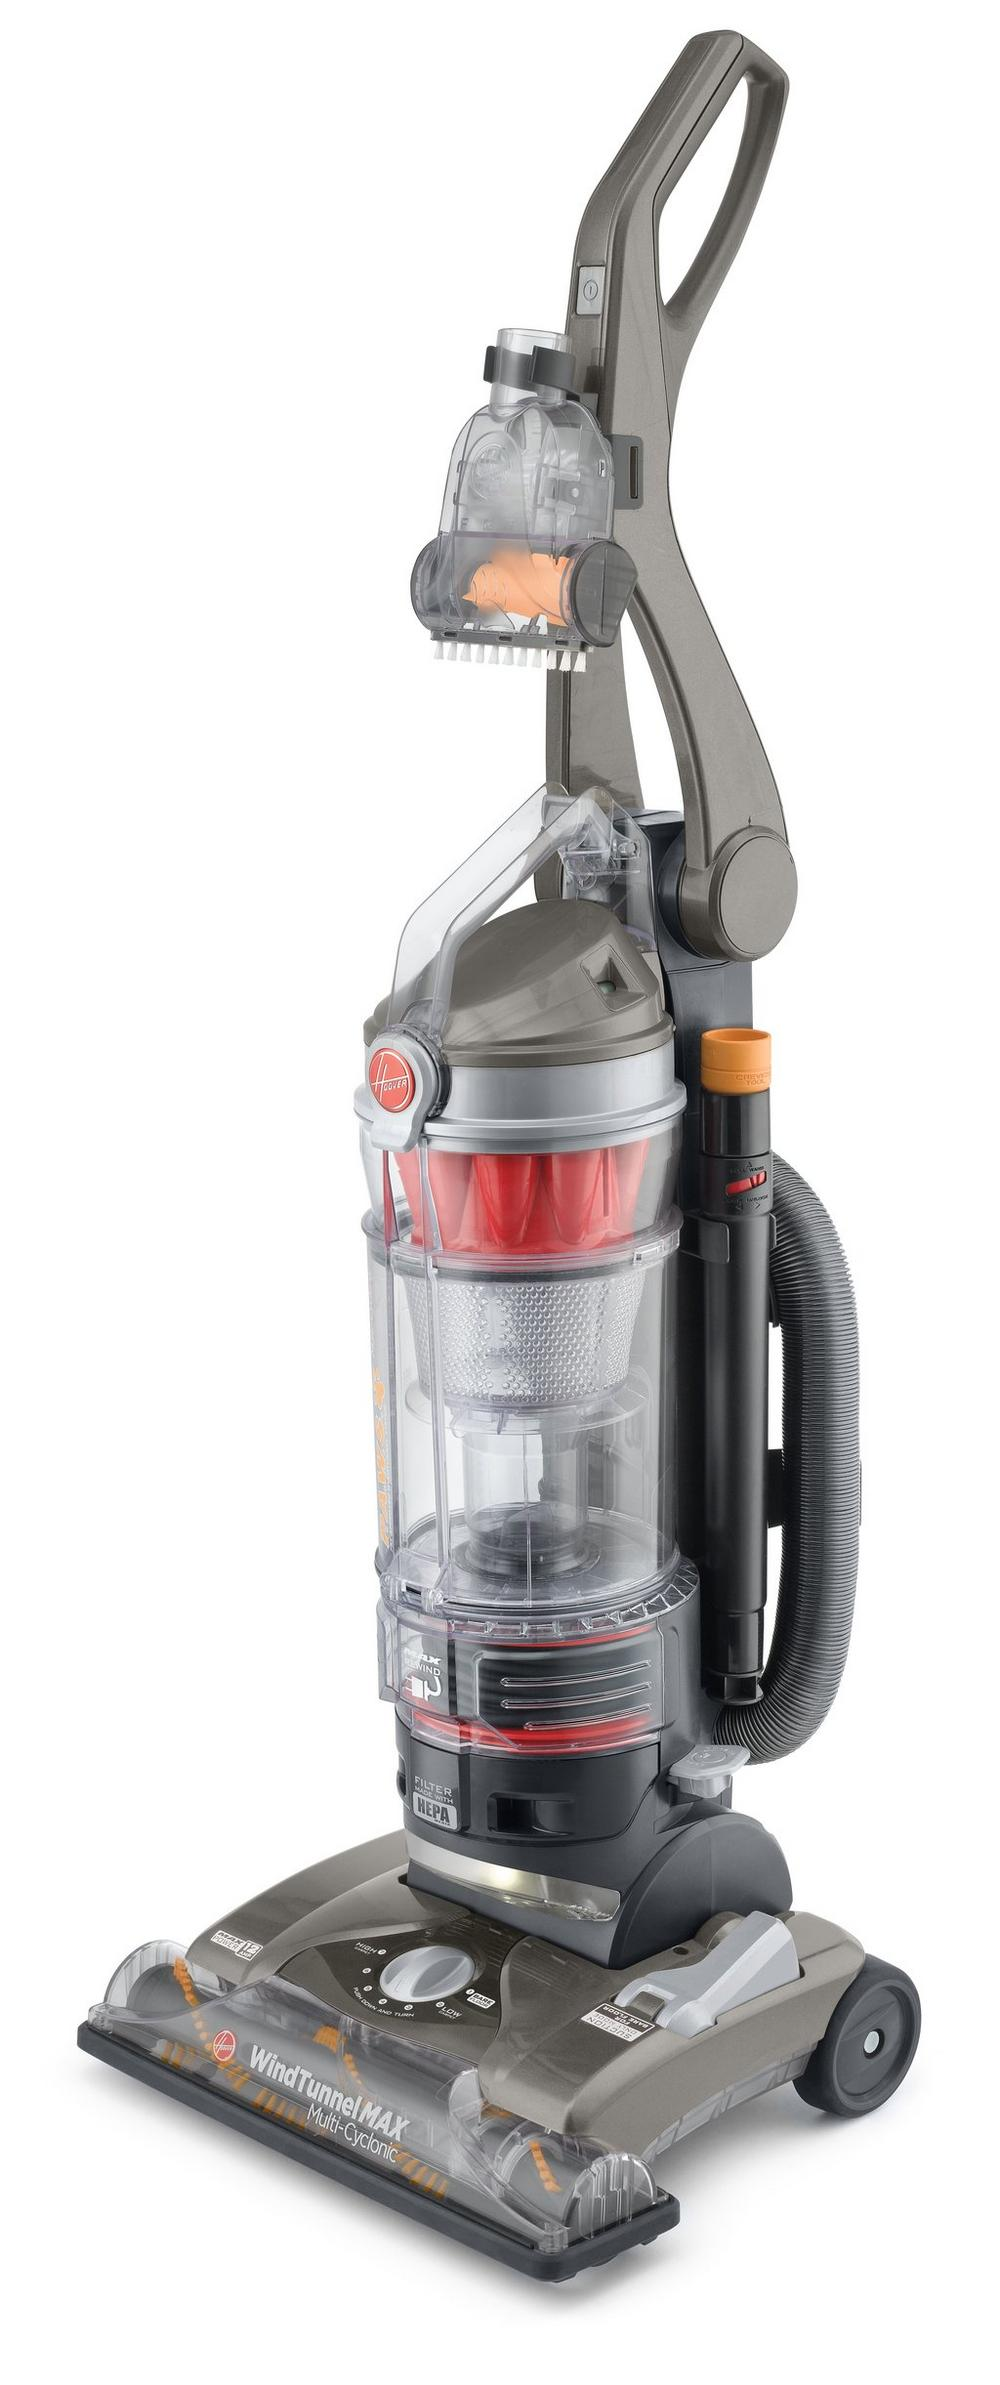 WindTunnel Max Pet T-Series Upright Vacuum2